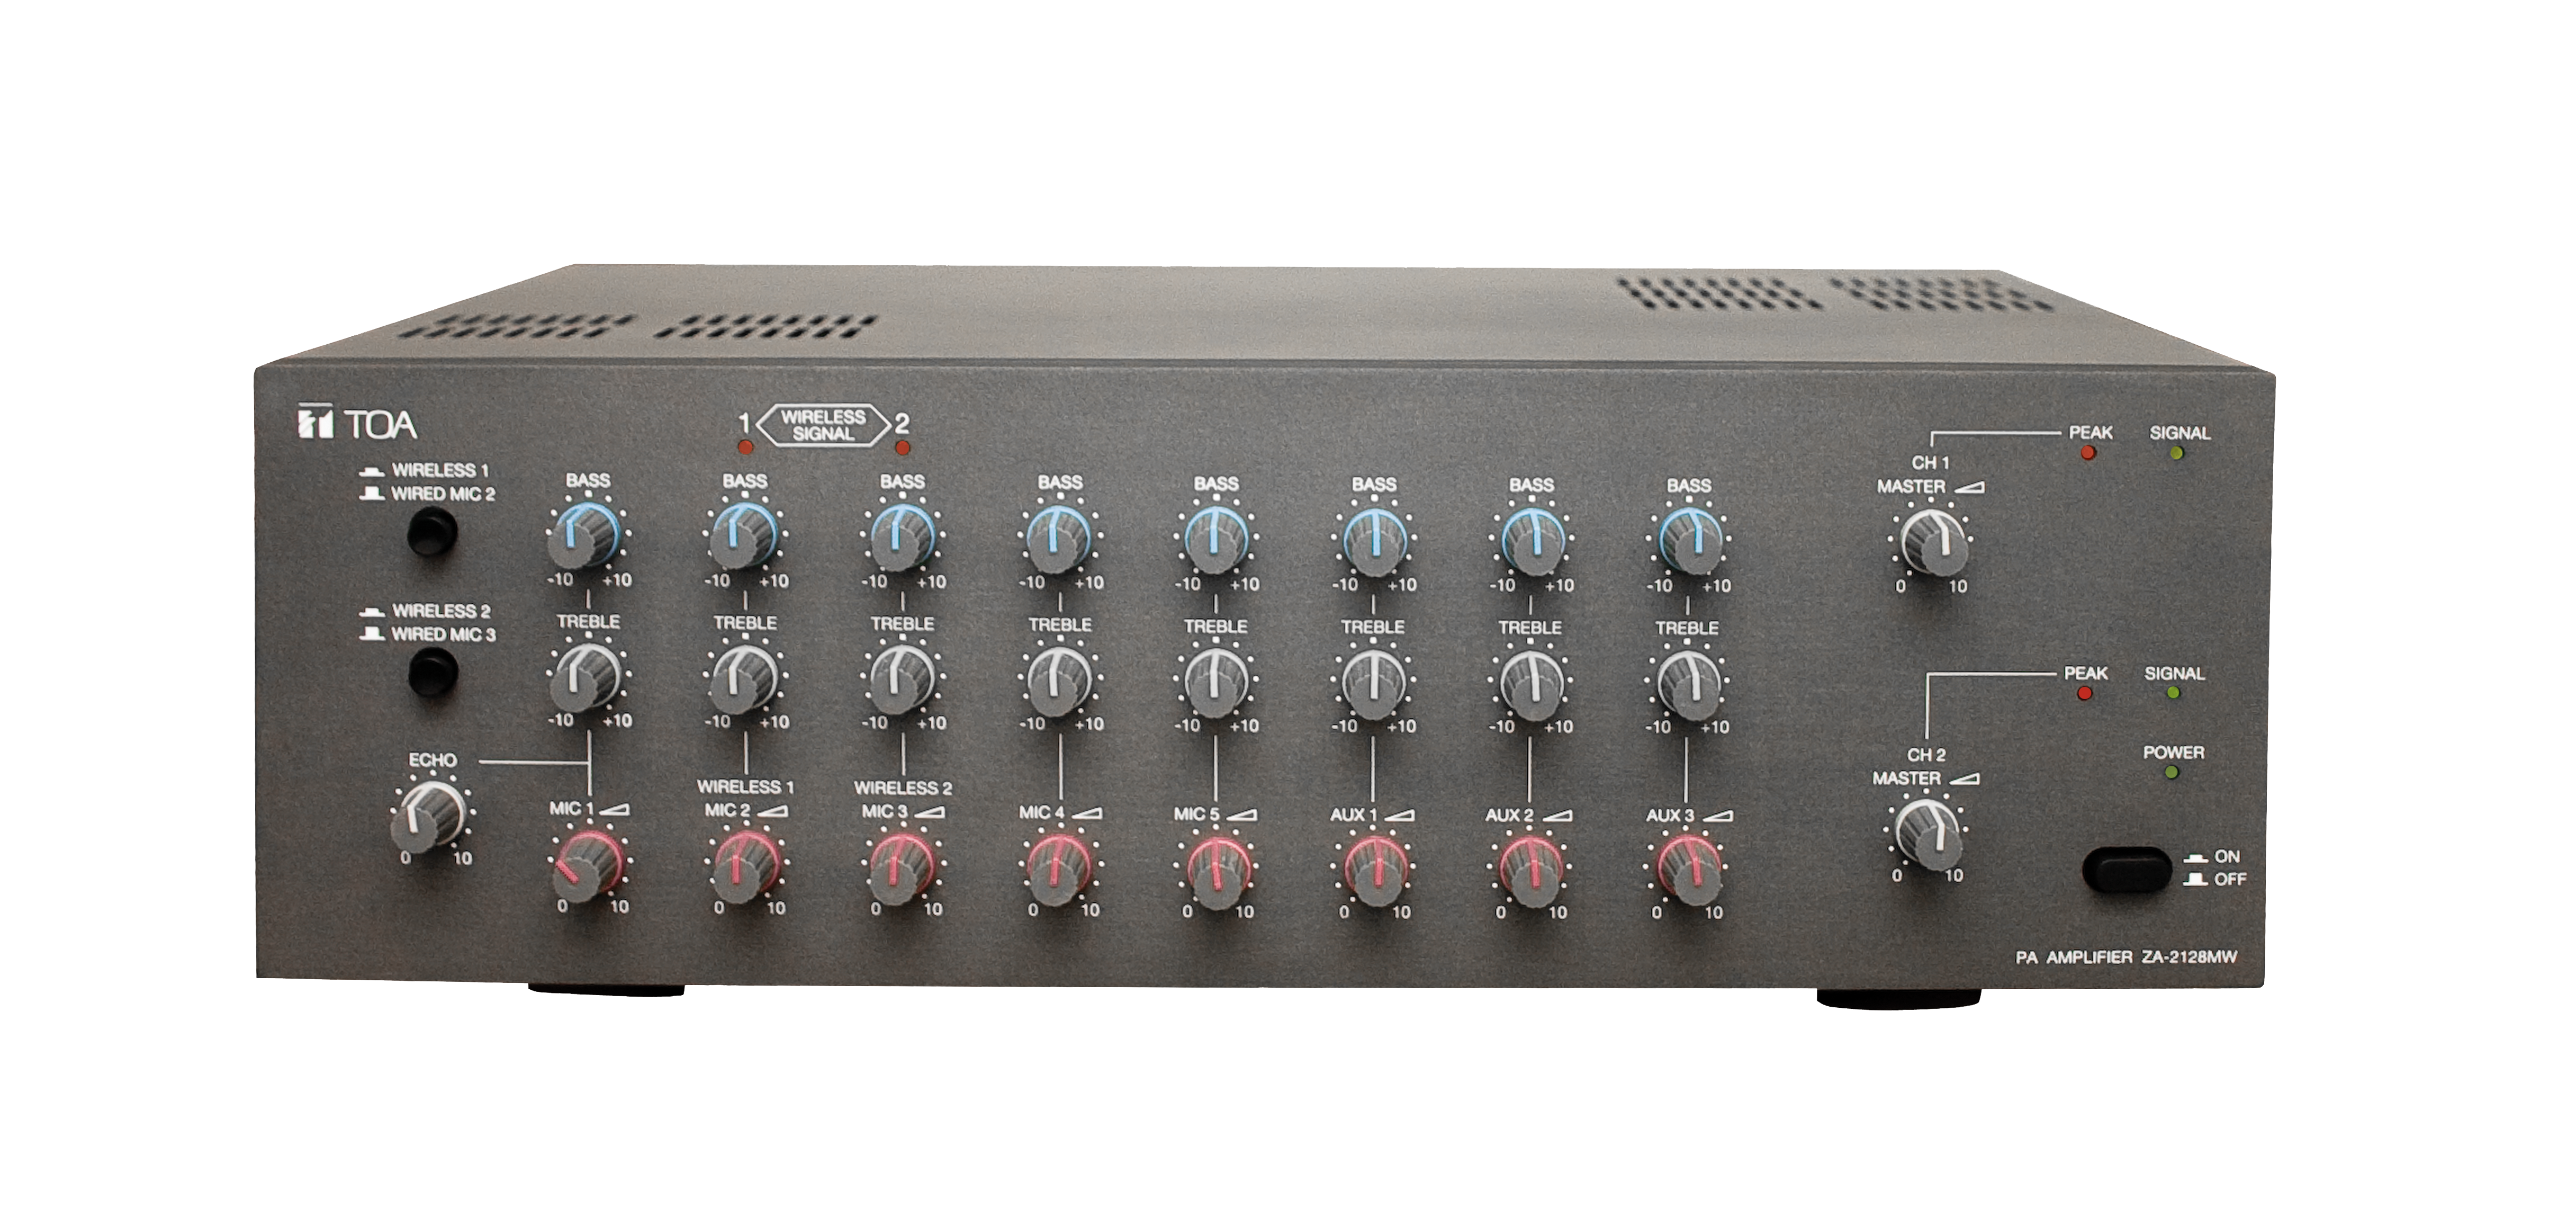 toa mixer amplifier za 2120 daftar update harga terbaru indonesia. Black Bedroom Furniture Sets. Home Design Ideas